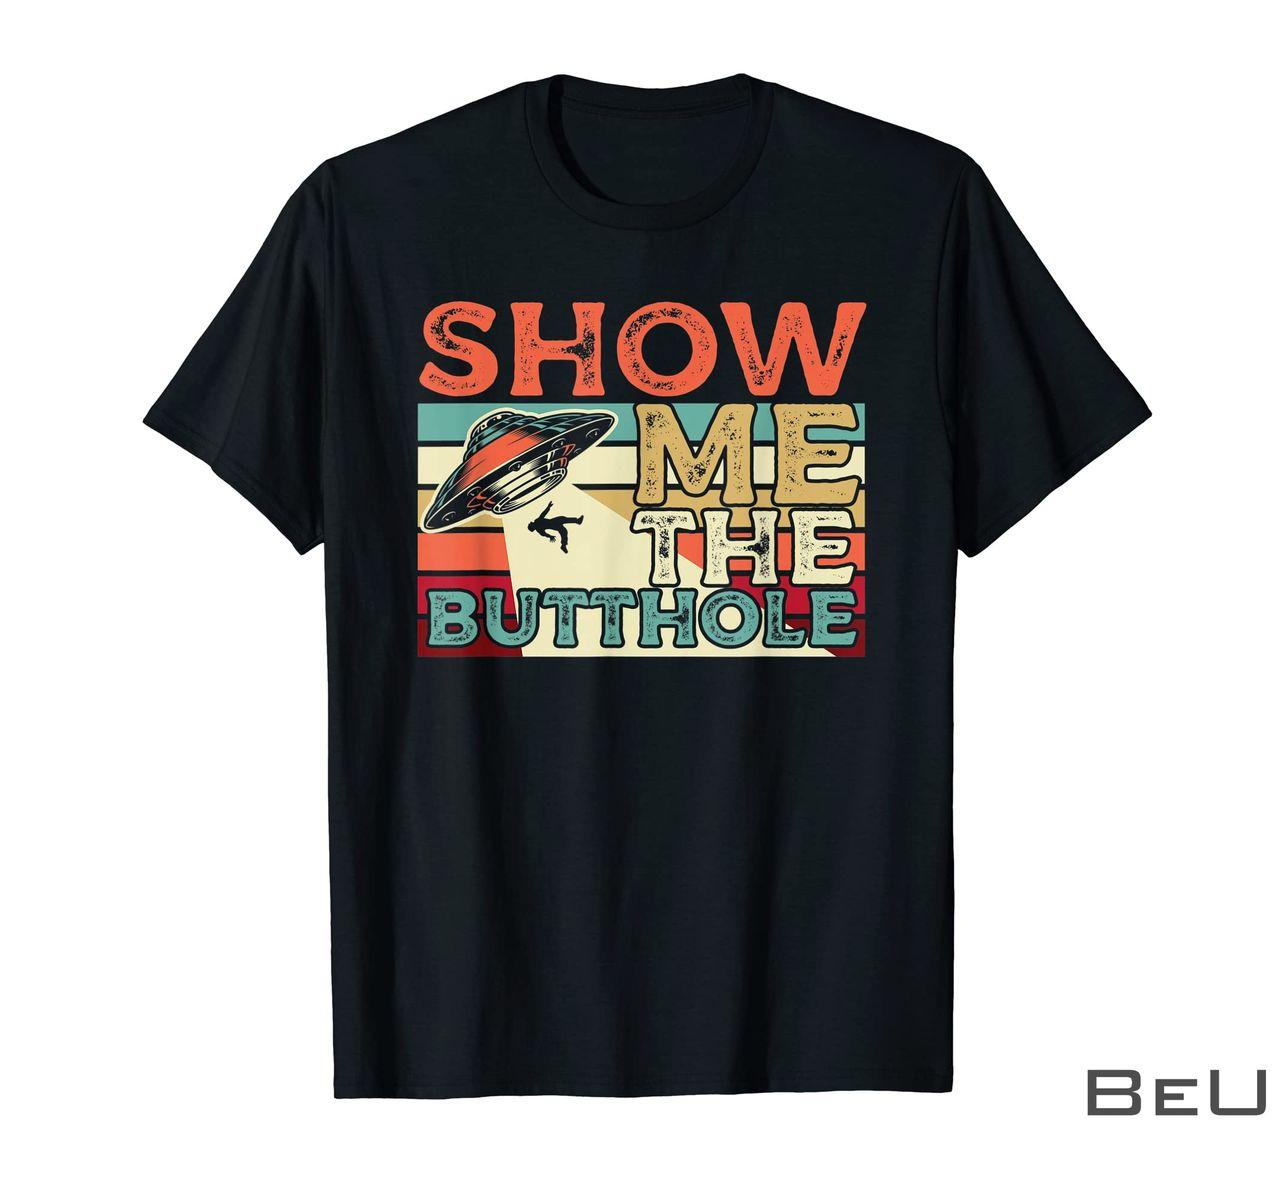 Show Me That Butthole Shirt